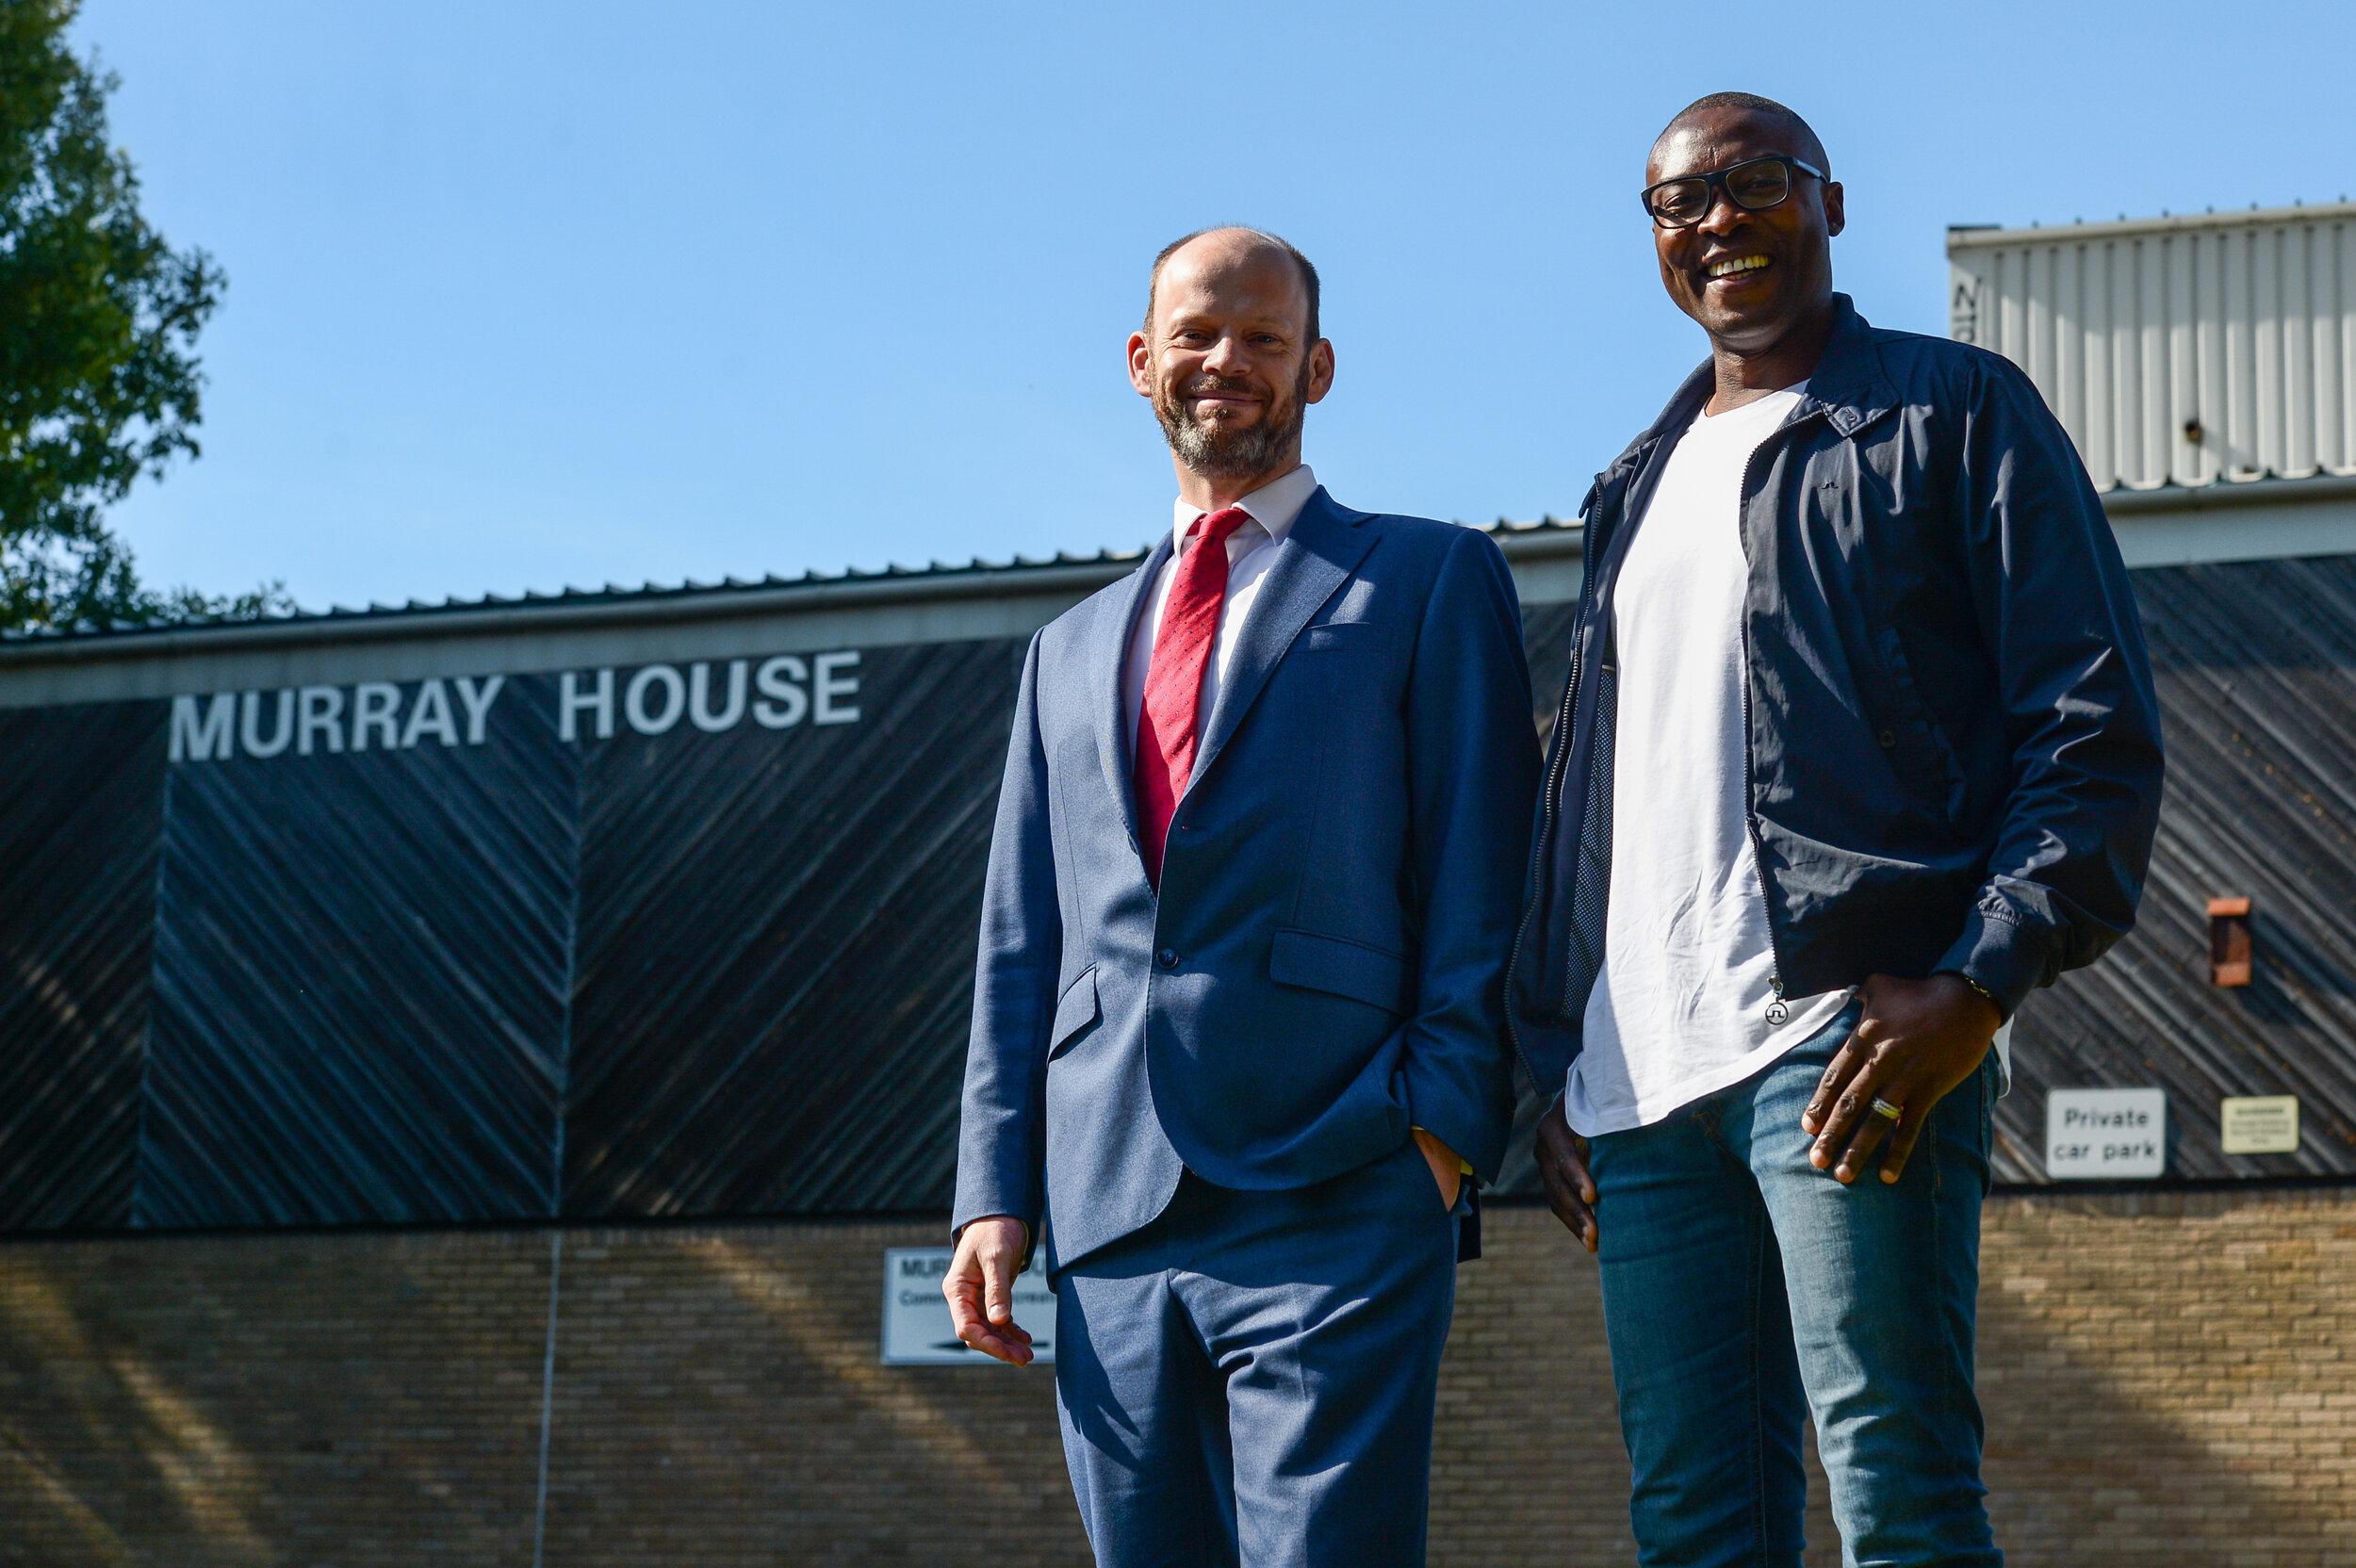 #NorthofTyne - Mayor Jamie Driscoll and NUFC Foundation patron Shola Ameobi at Murray House